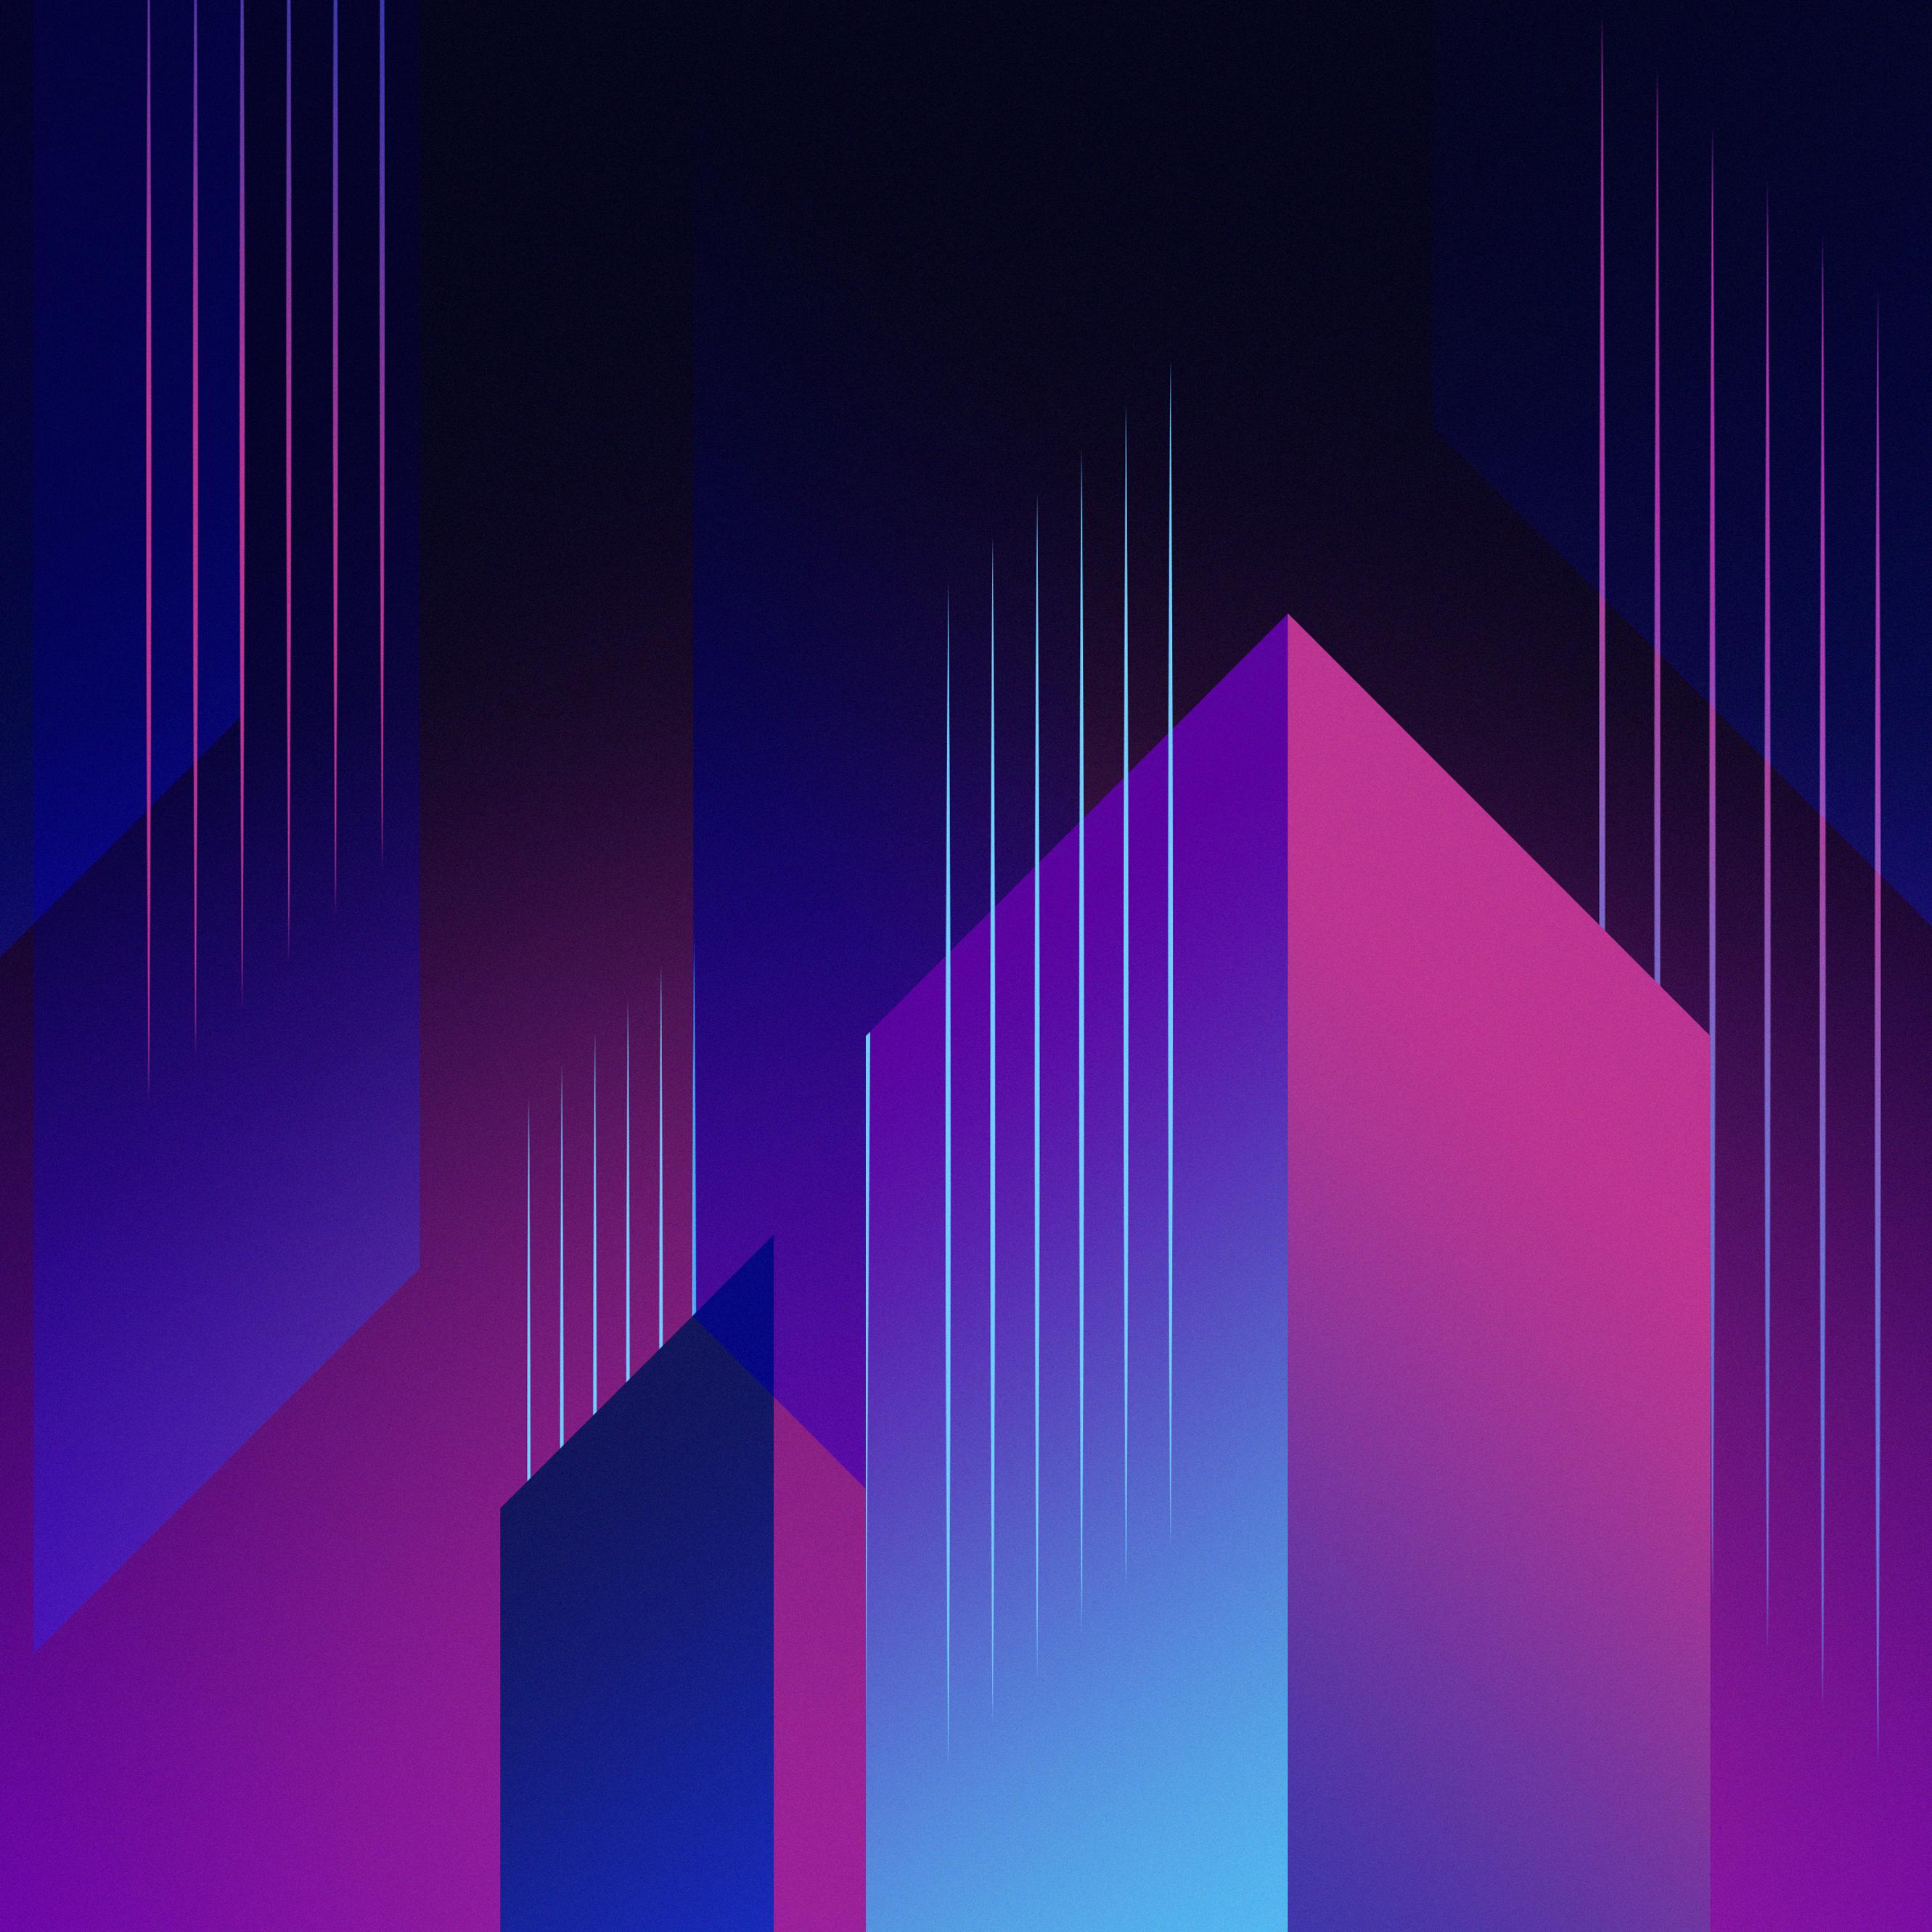 HTC-U11-Plus-Stock-Wallpapers-01-TechFoogle